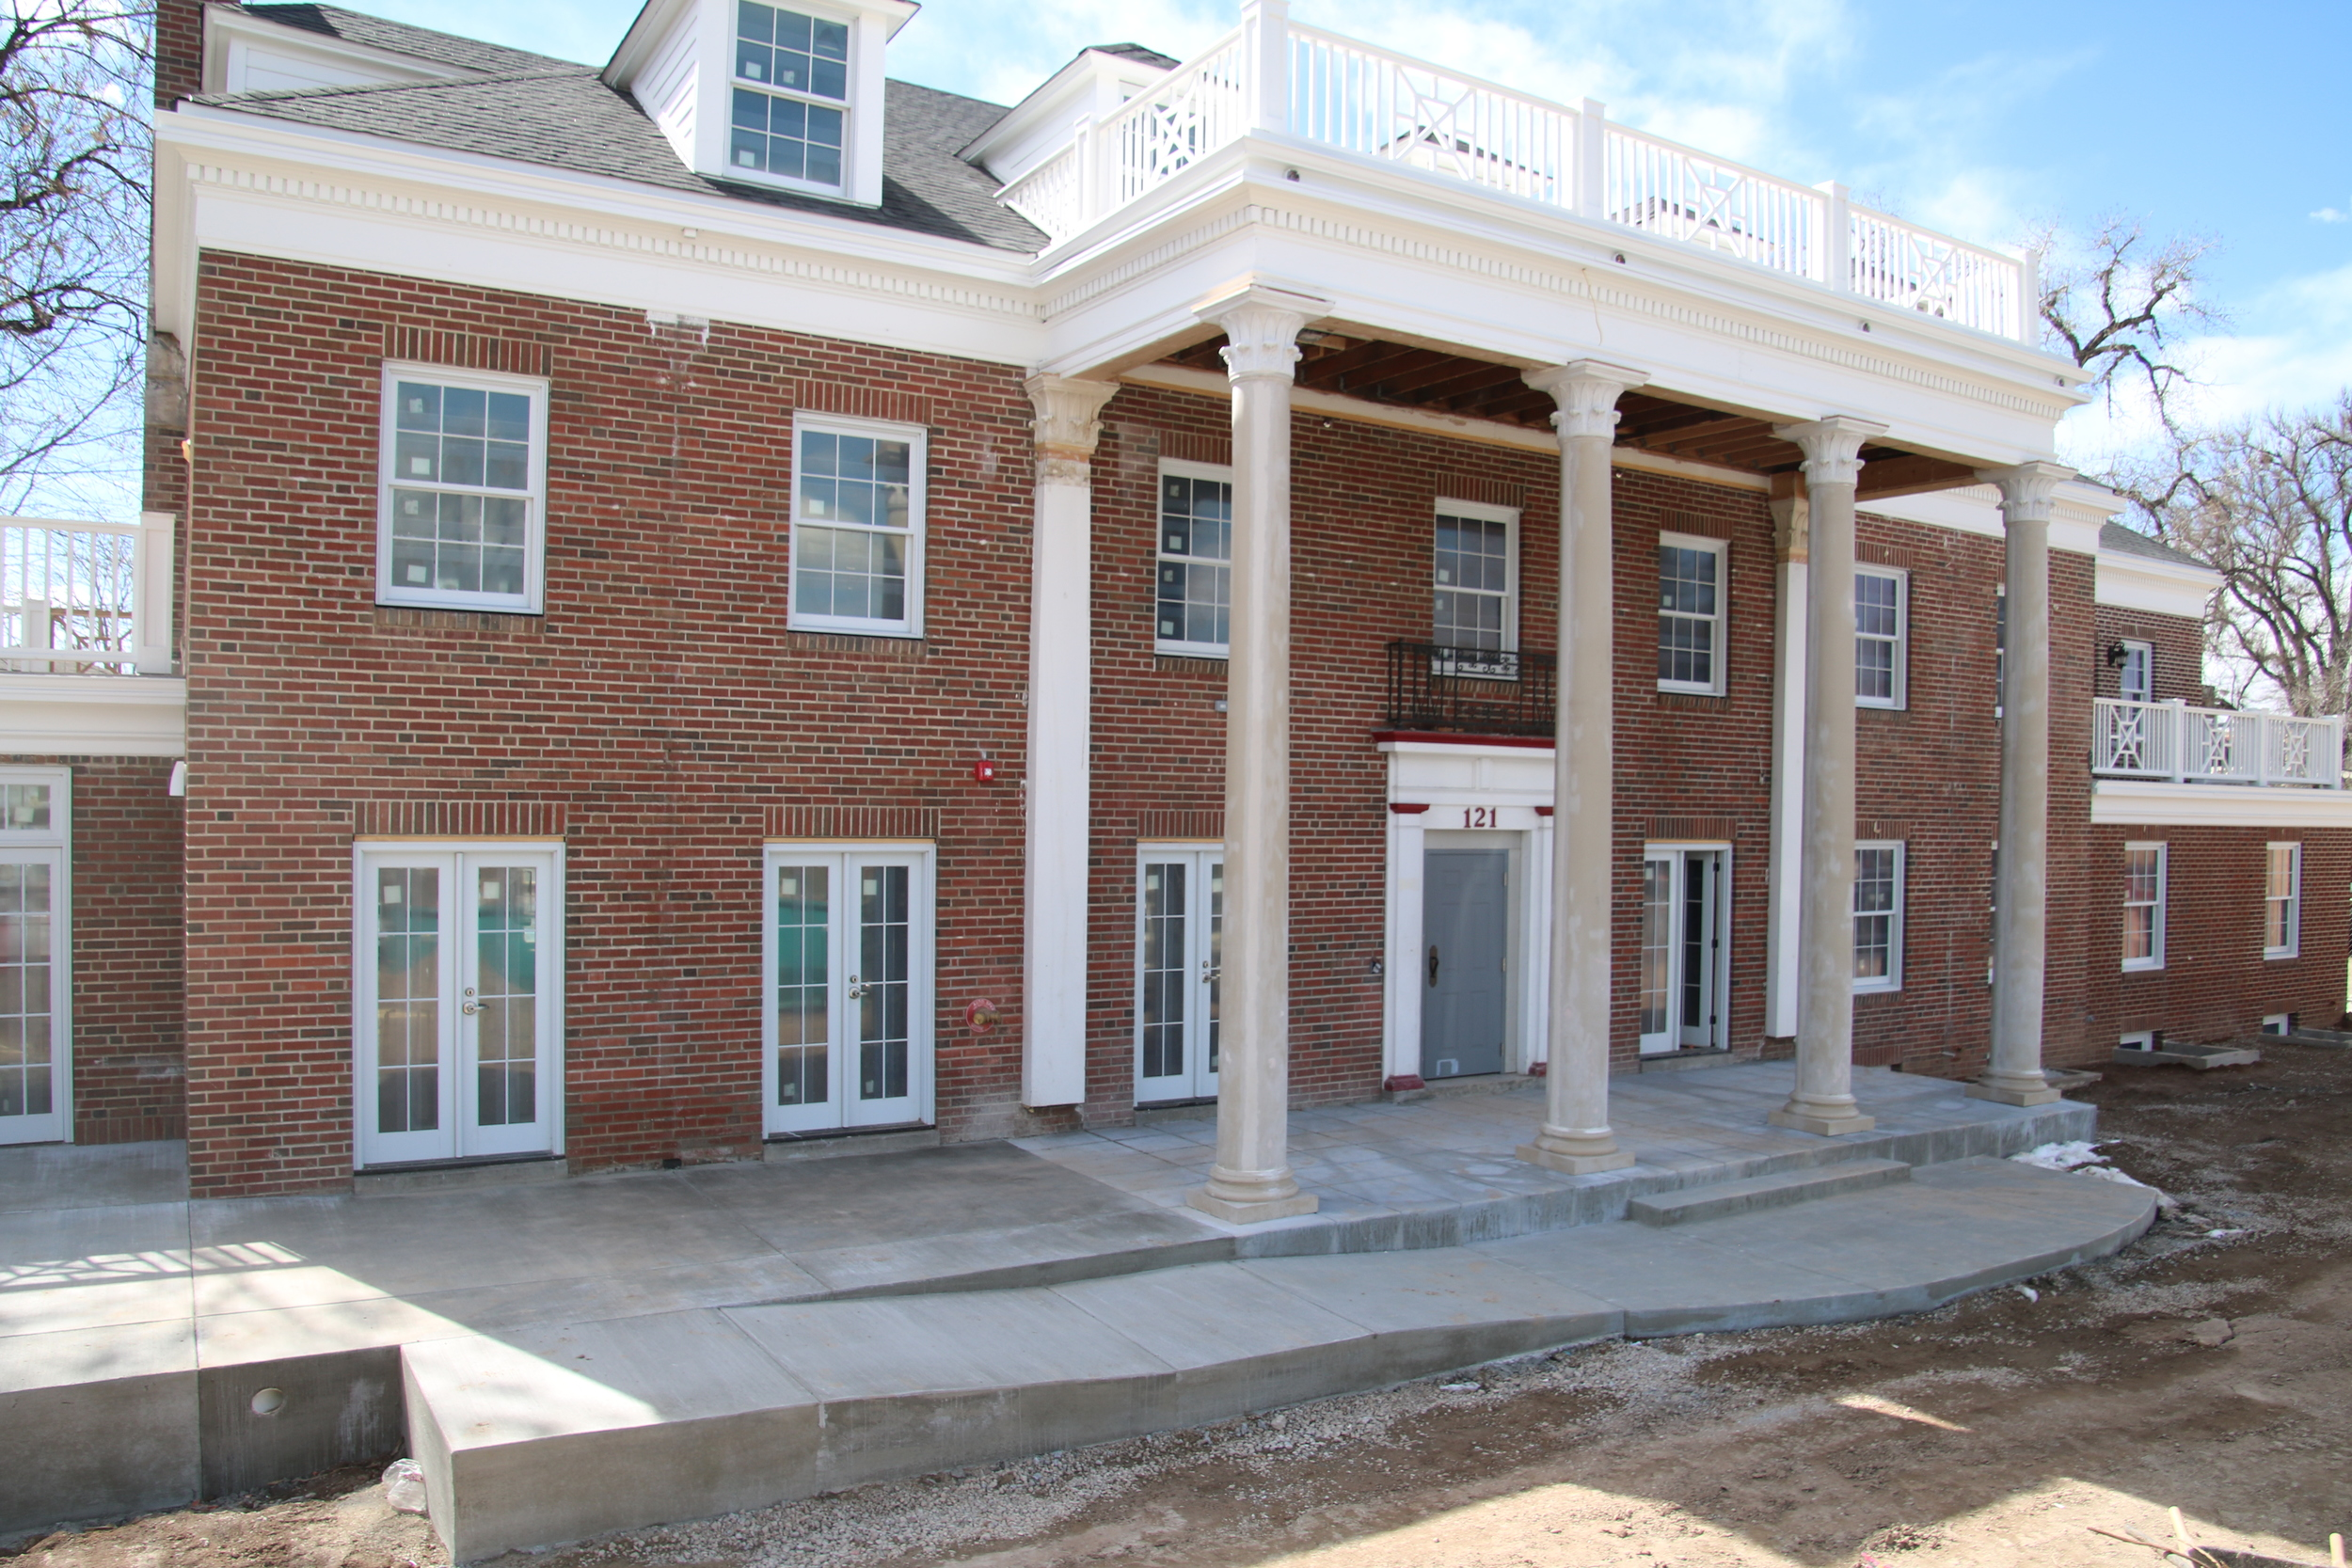 New columns, portico, porch, and accessibility ramp